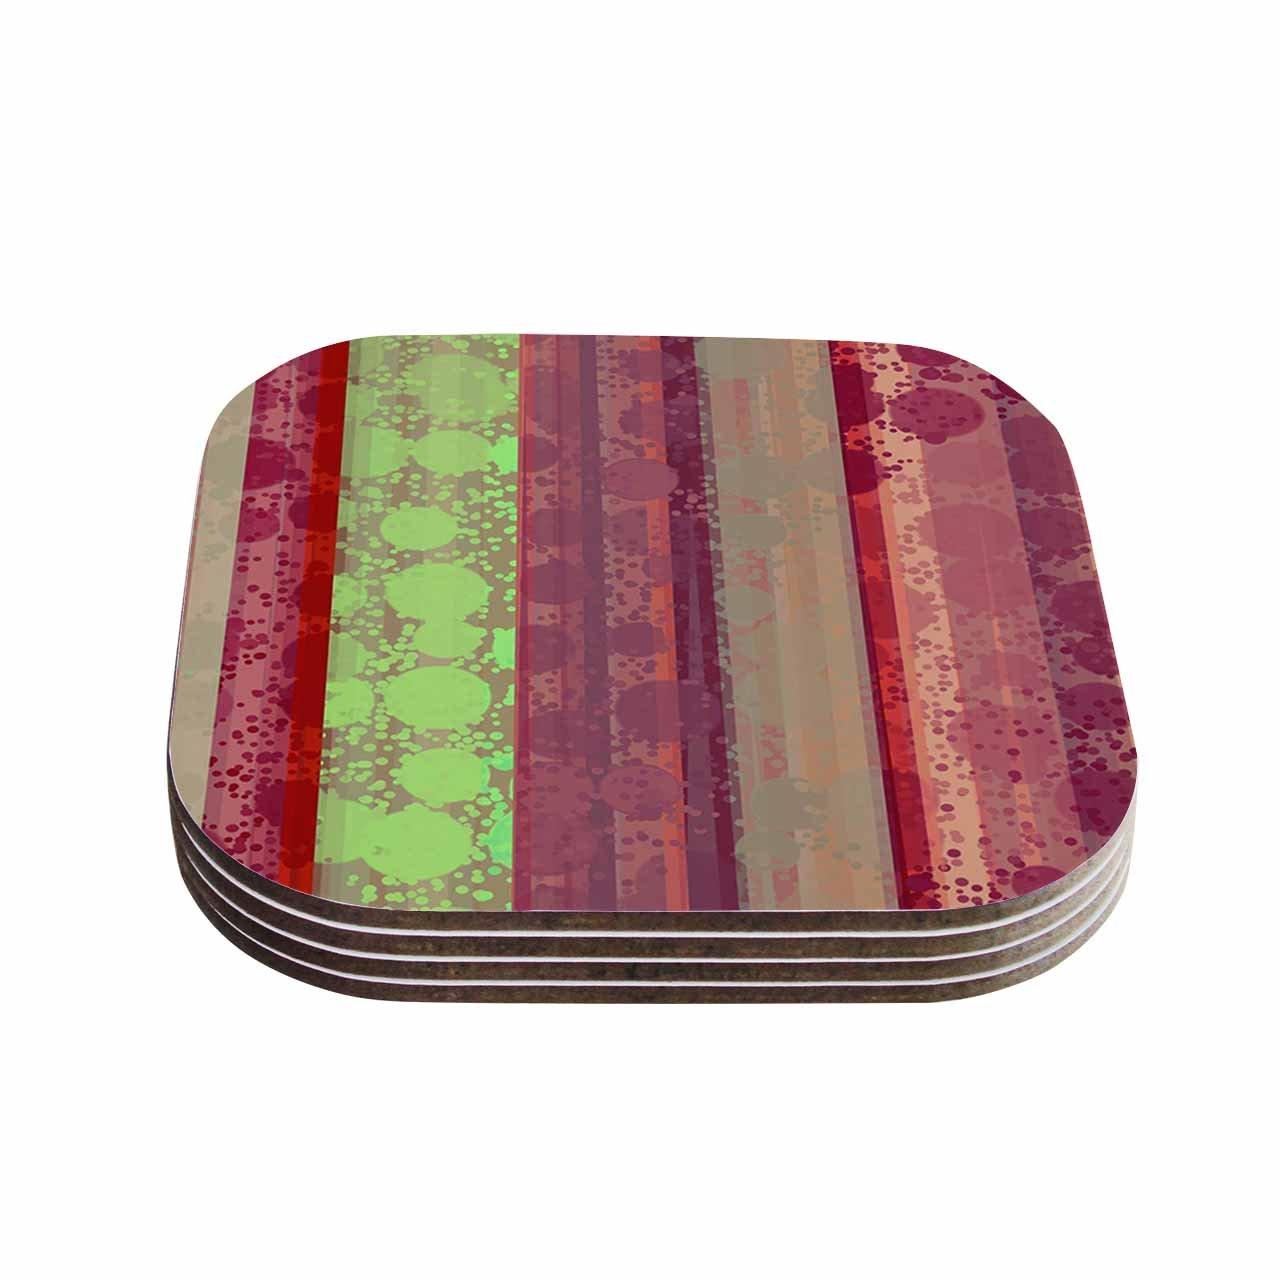 Set of 4 4 x 4 KESS InHouse Cvetelina TodorovaMagic Carpet Green Maroon Coasters Multicolor